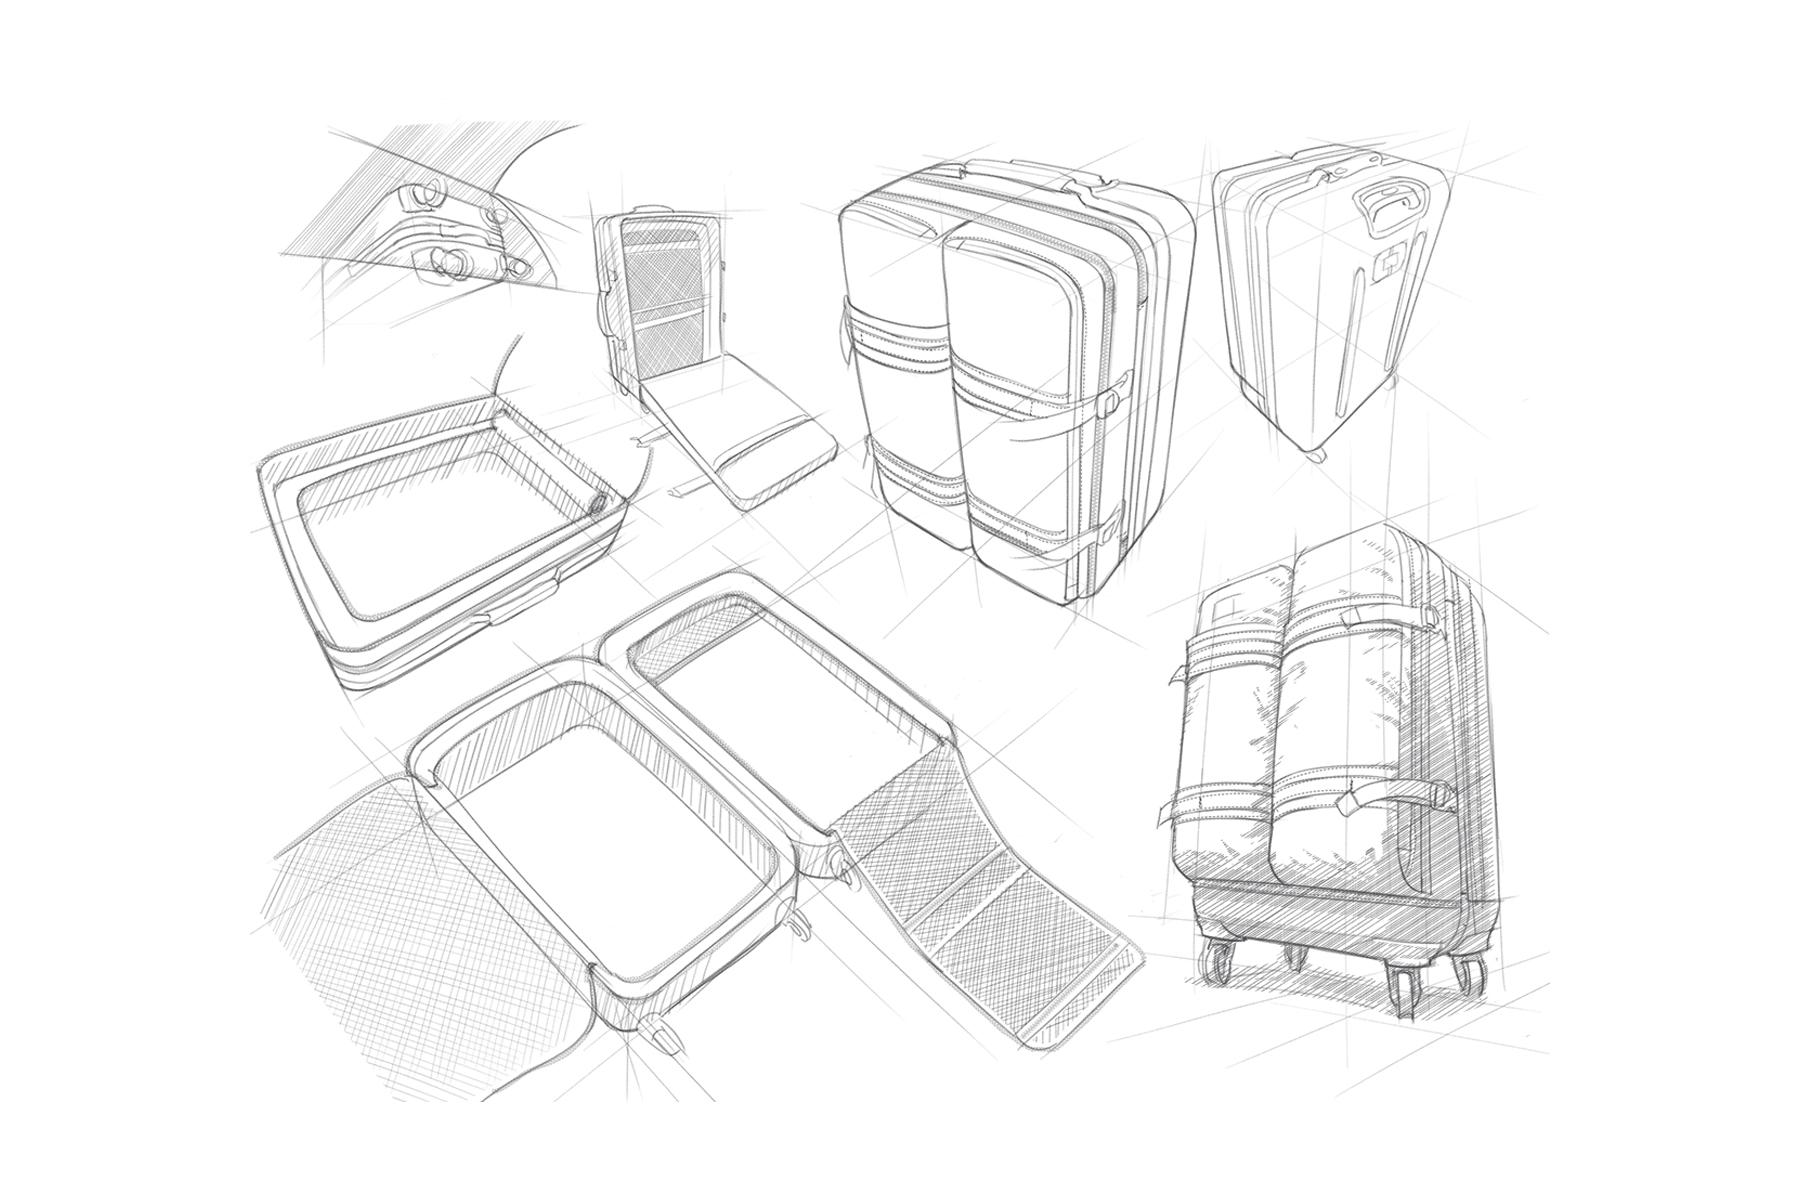 5a10fad8180 Onderdeel van uw koffer stuk? - KofferStunter. OGIO: Golf, Backpacks,  Travel Luggage